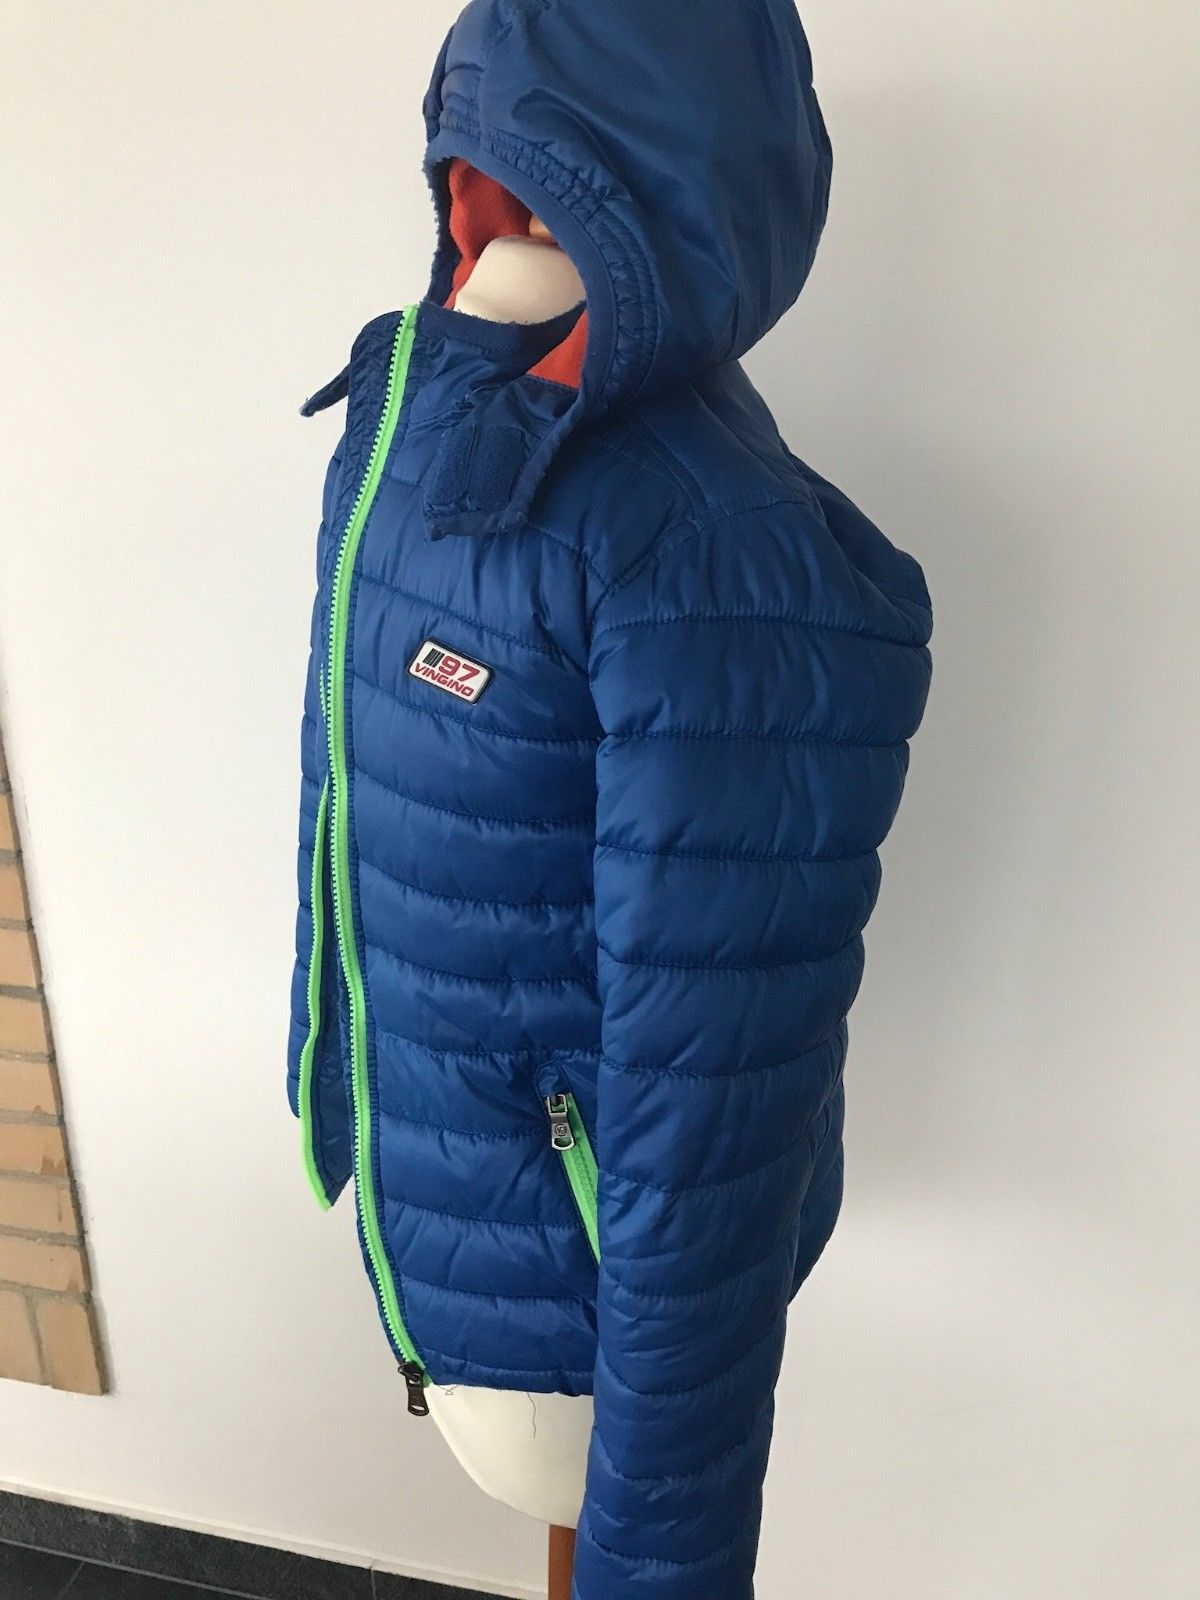 Vingino - Winterjacke mit Kapuze Kinderjacke Jacke Jungen Blau 12 Jahre Gr. 152